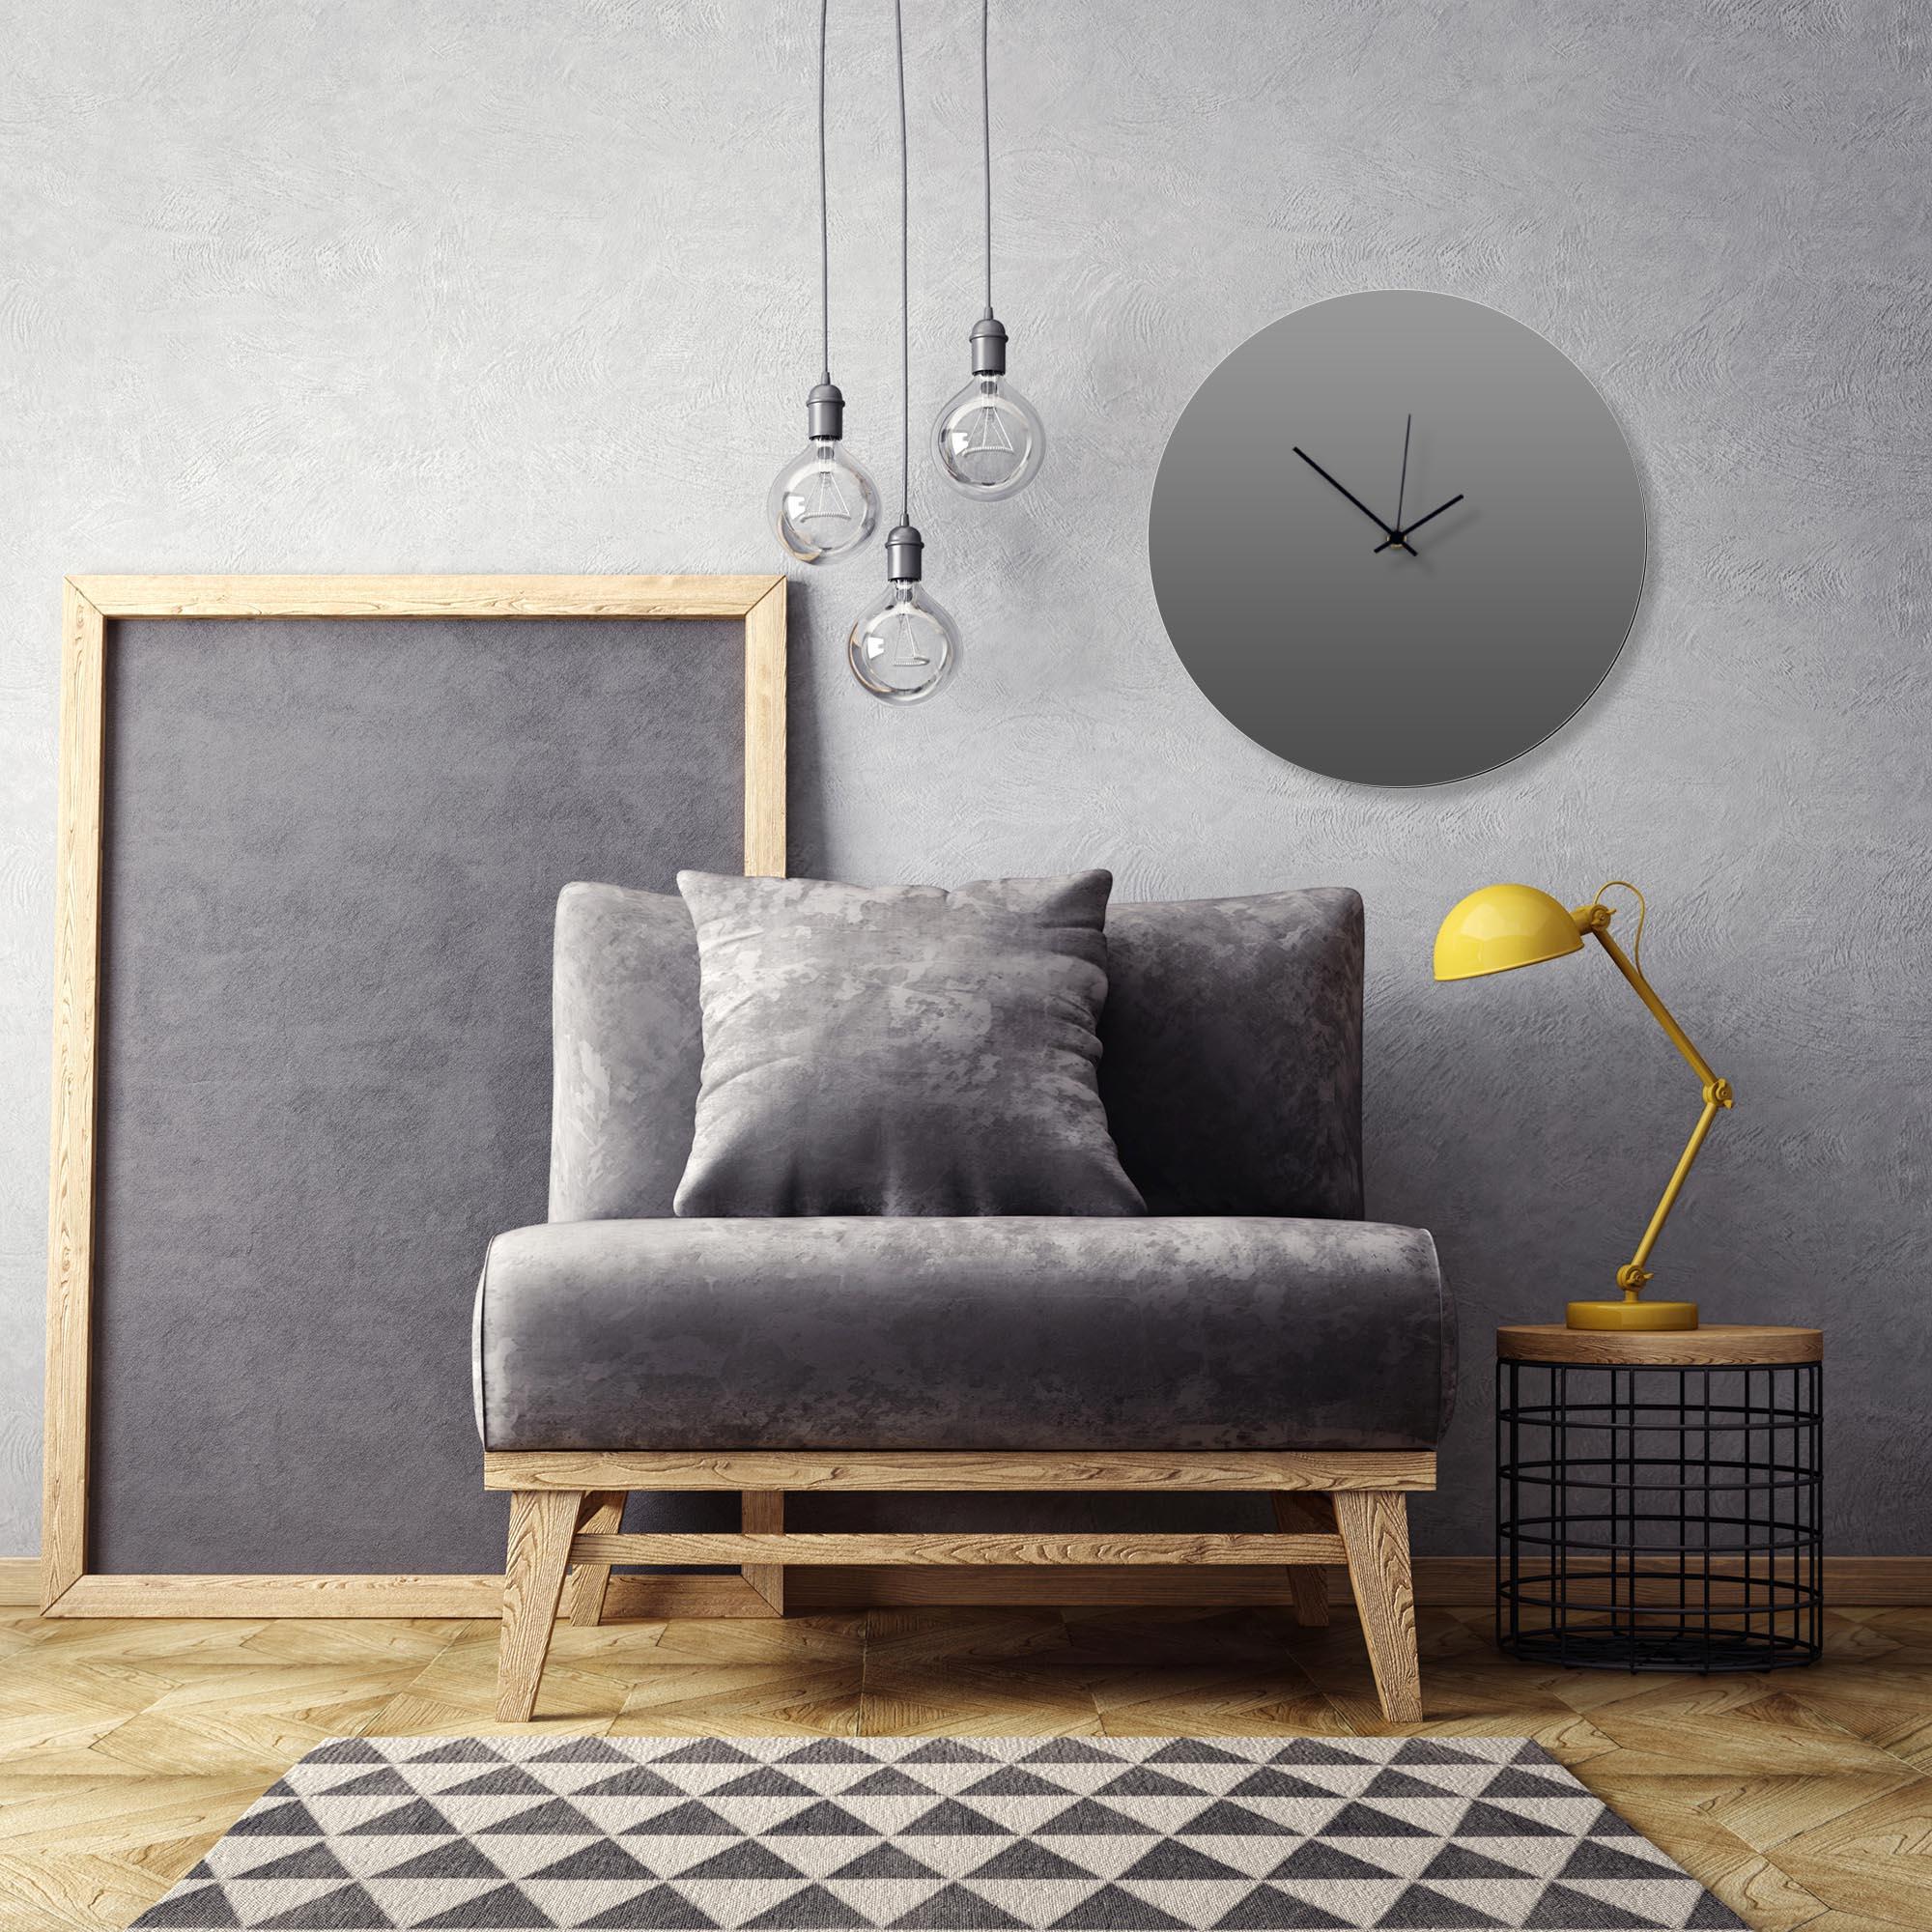 Grayout Black Circle Clock Large by Adam Schwoeppe Contemporary Clock on Aluminum Polymetal - Alternate View 1